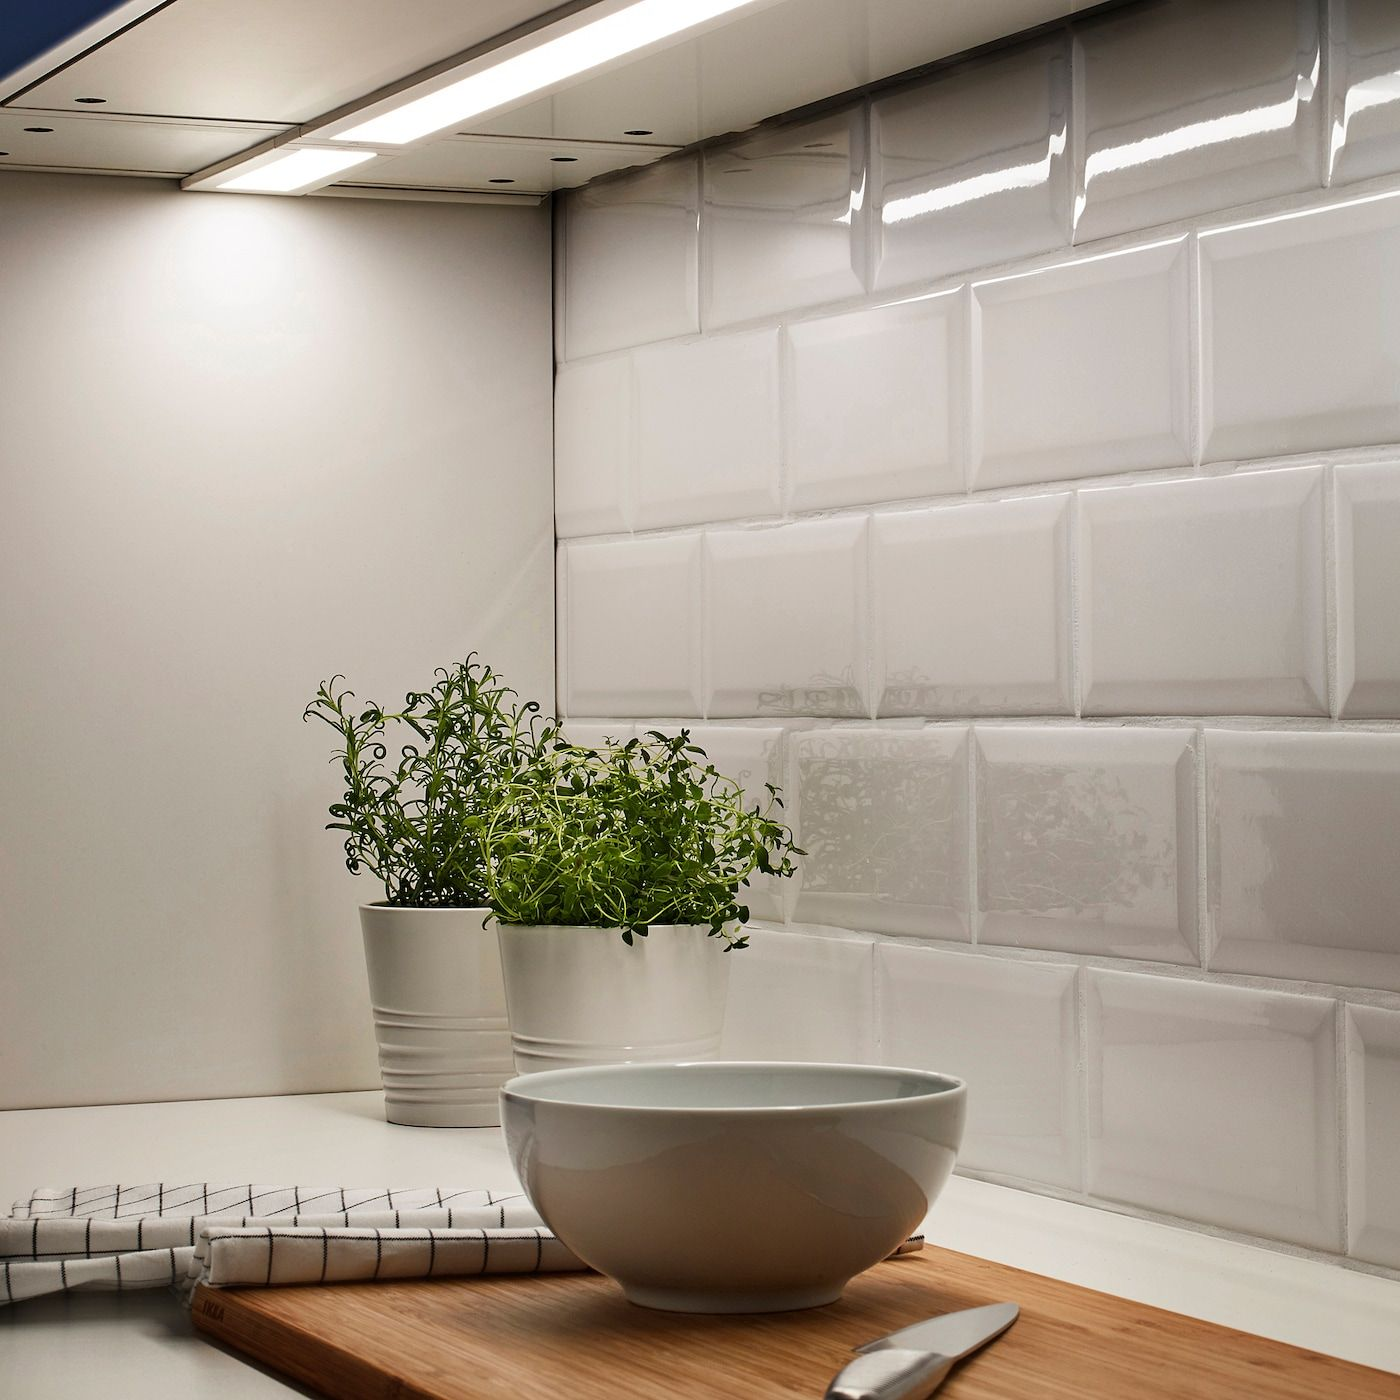 Ikea Stromlinje White Led Countertop Light In 2020 Led Ikea Countertops